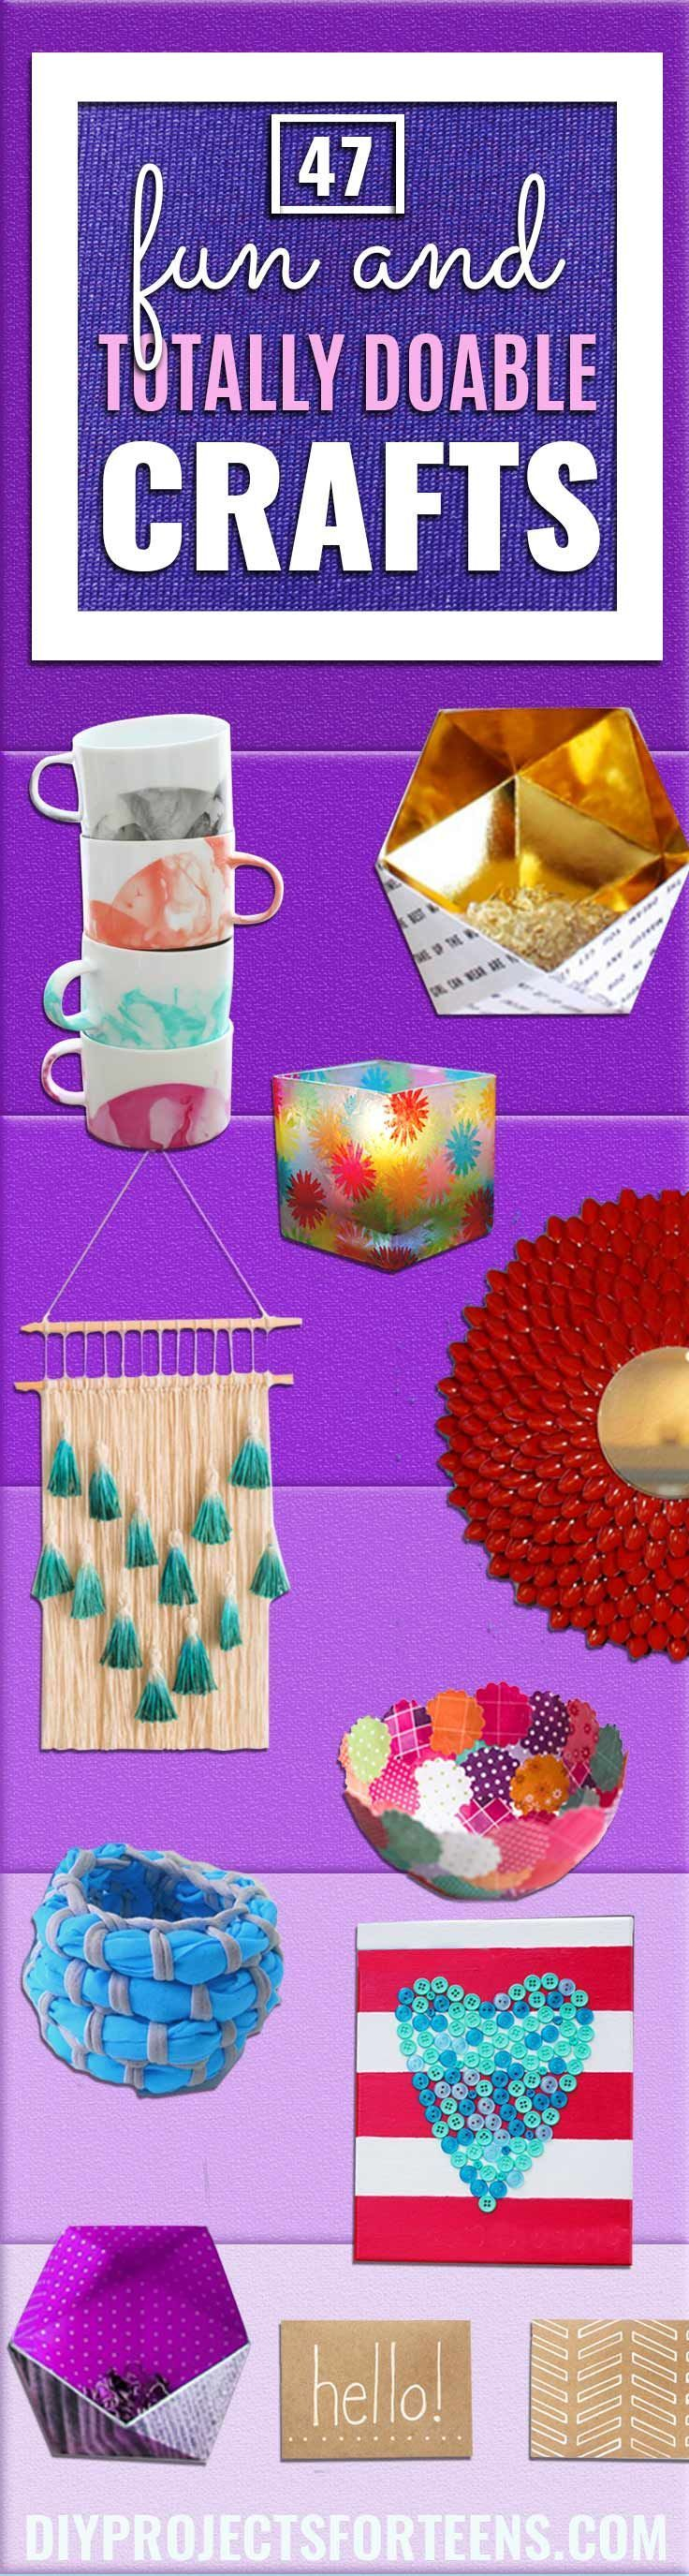 47 fun pinterest crafts that arent impossible manualidade 47 fun pinterest crafts that arent impossible solutioingenieria Images